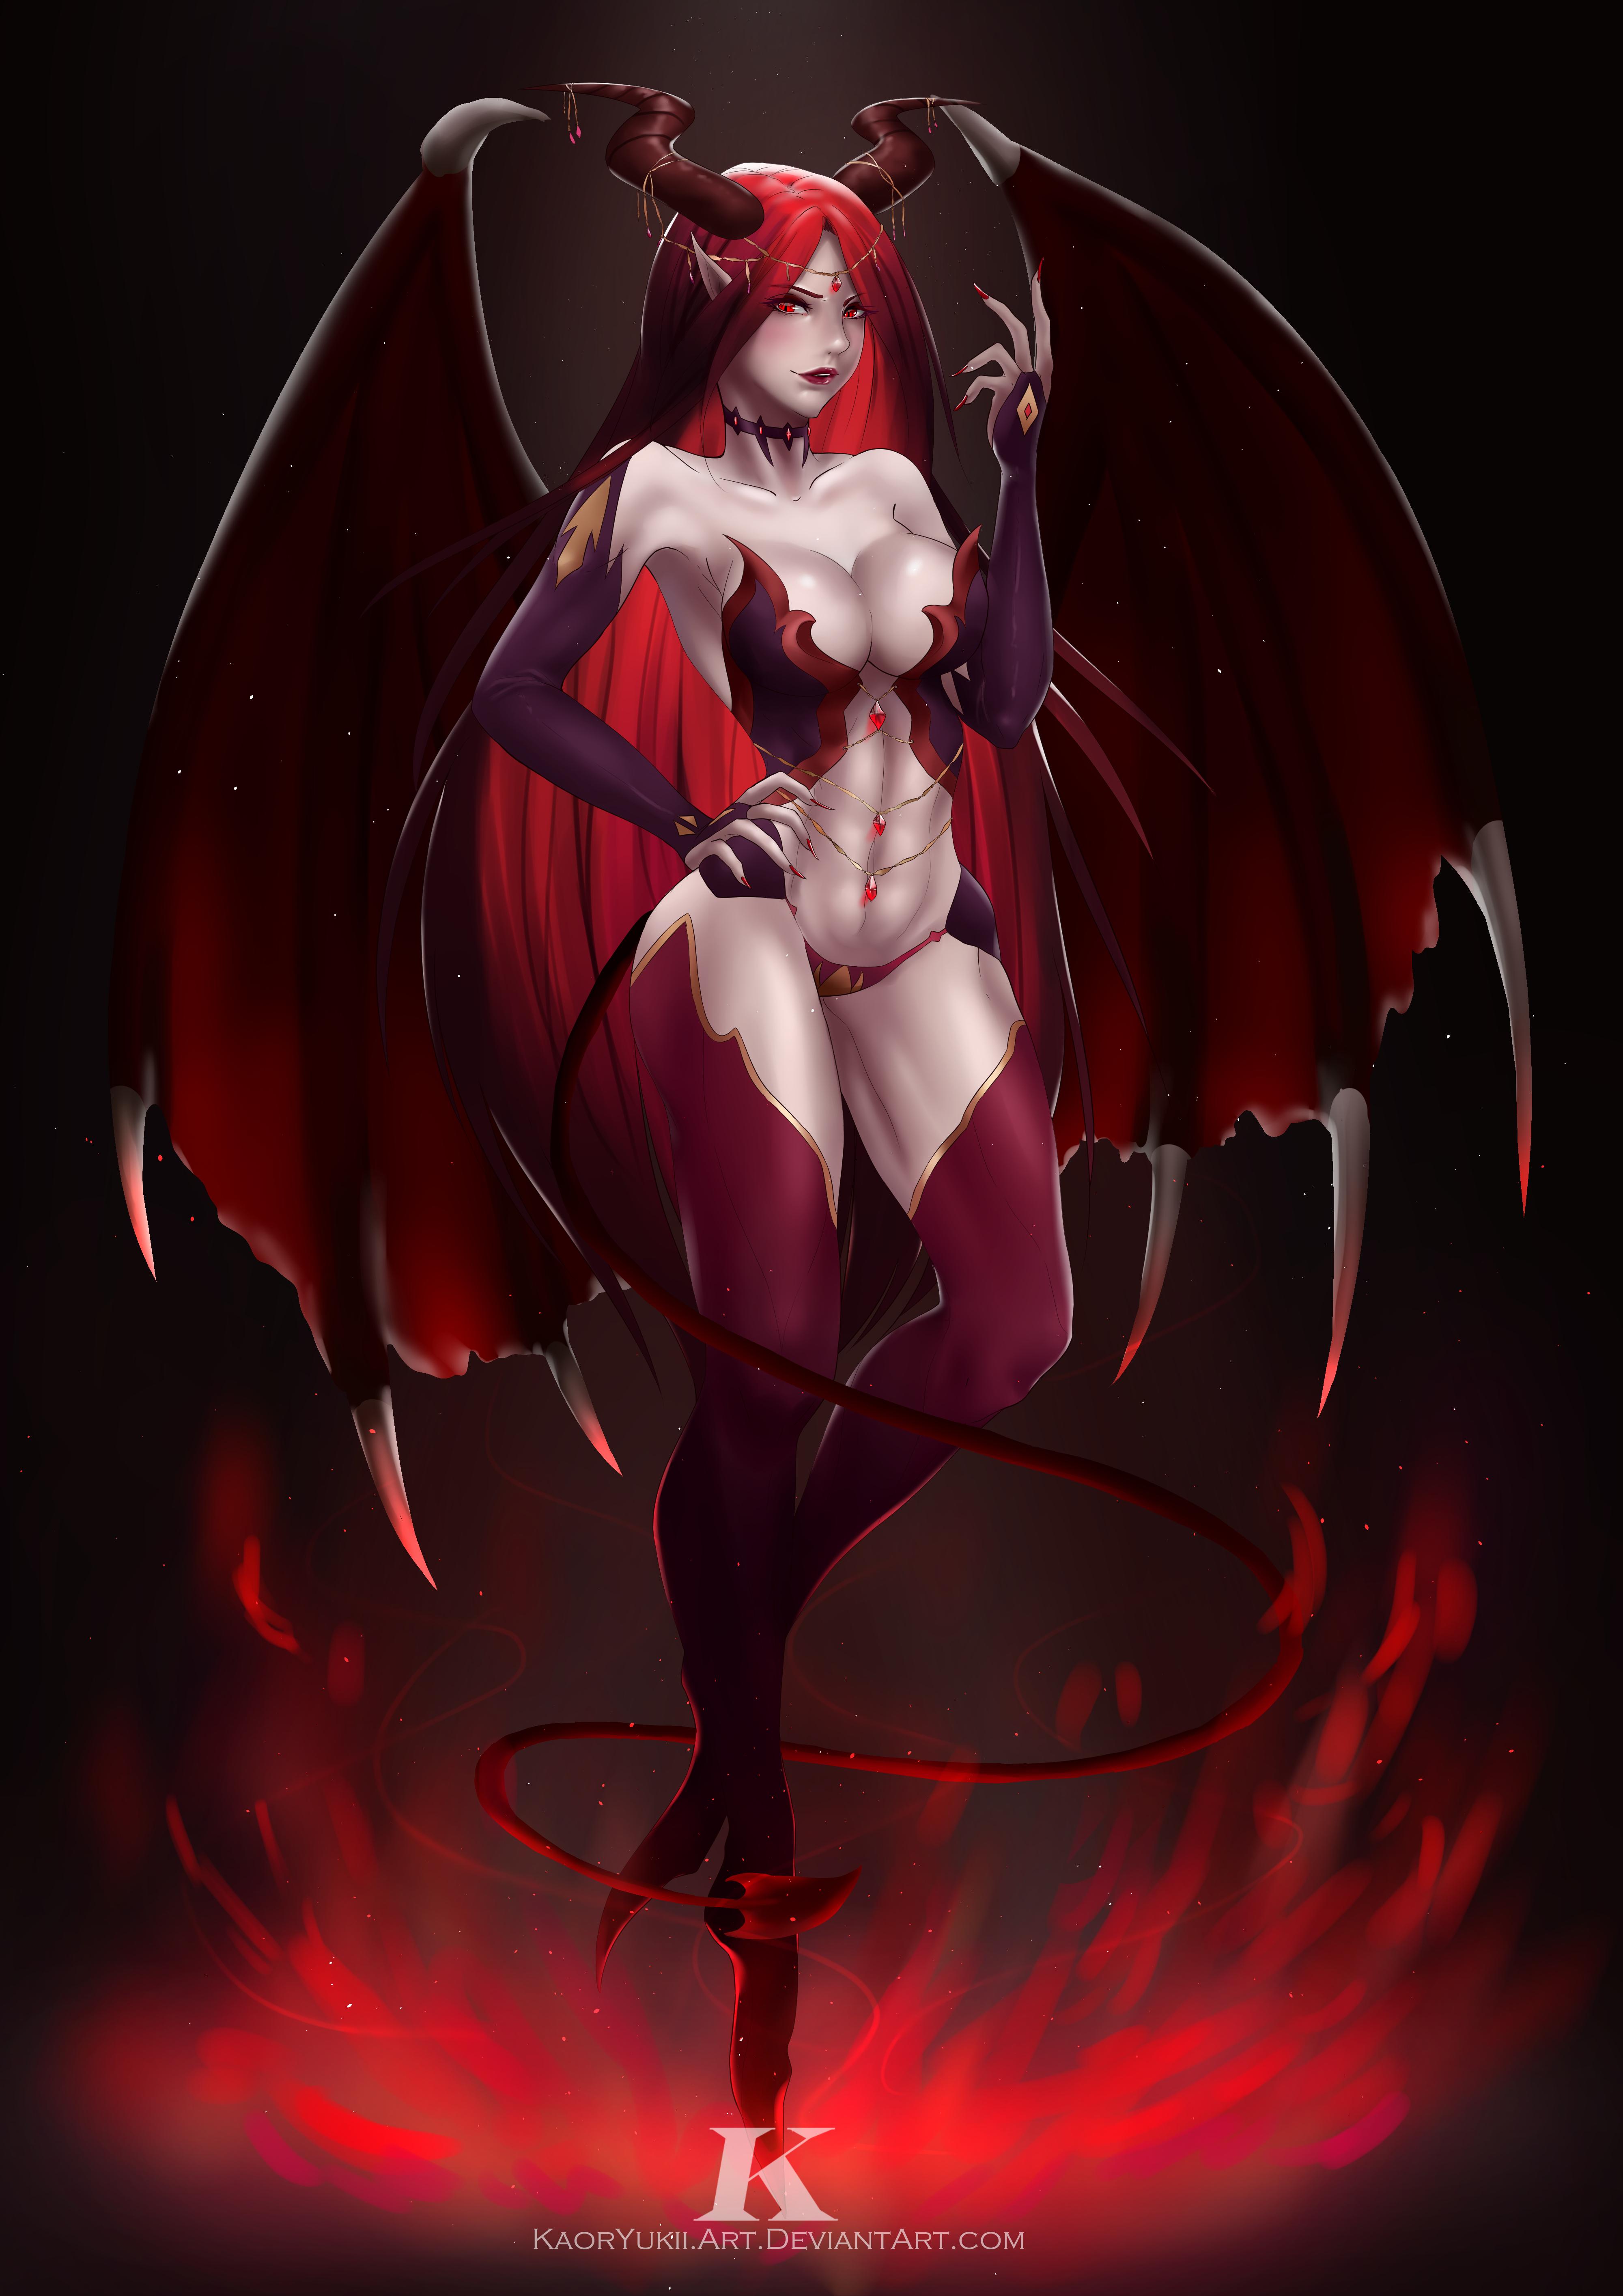 [O.C - KaoriYuki Demon]